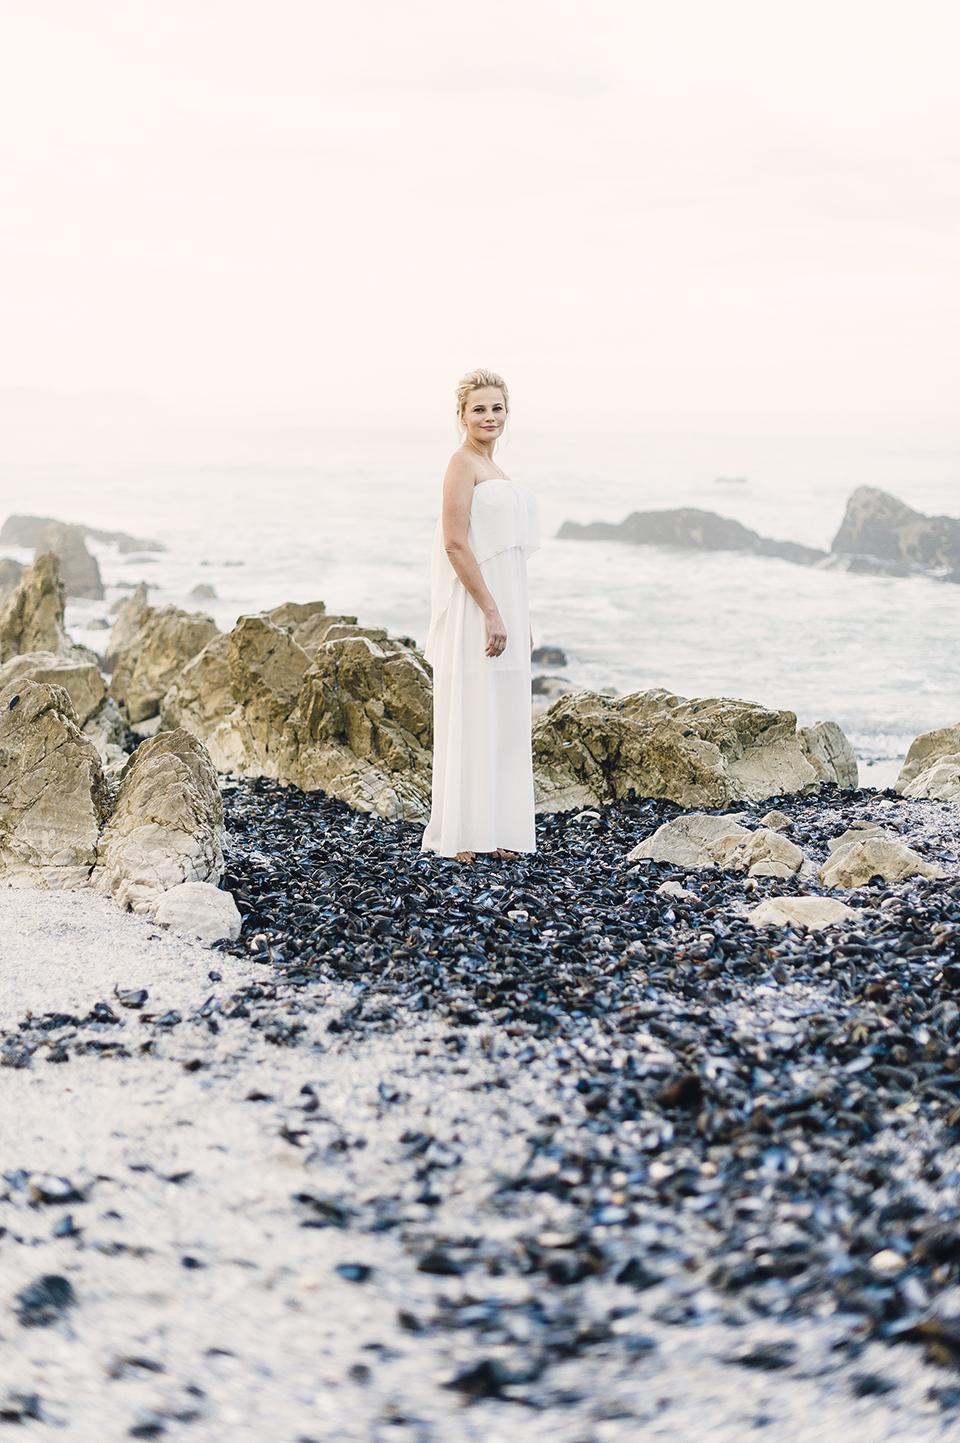 RyanParker_CapeTown_Photographer_Wedding_Hermanus_A&B_DSC_9142.jpg